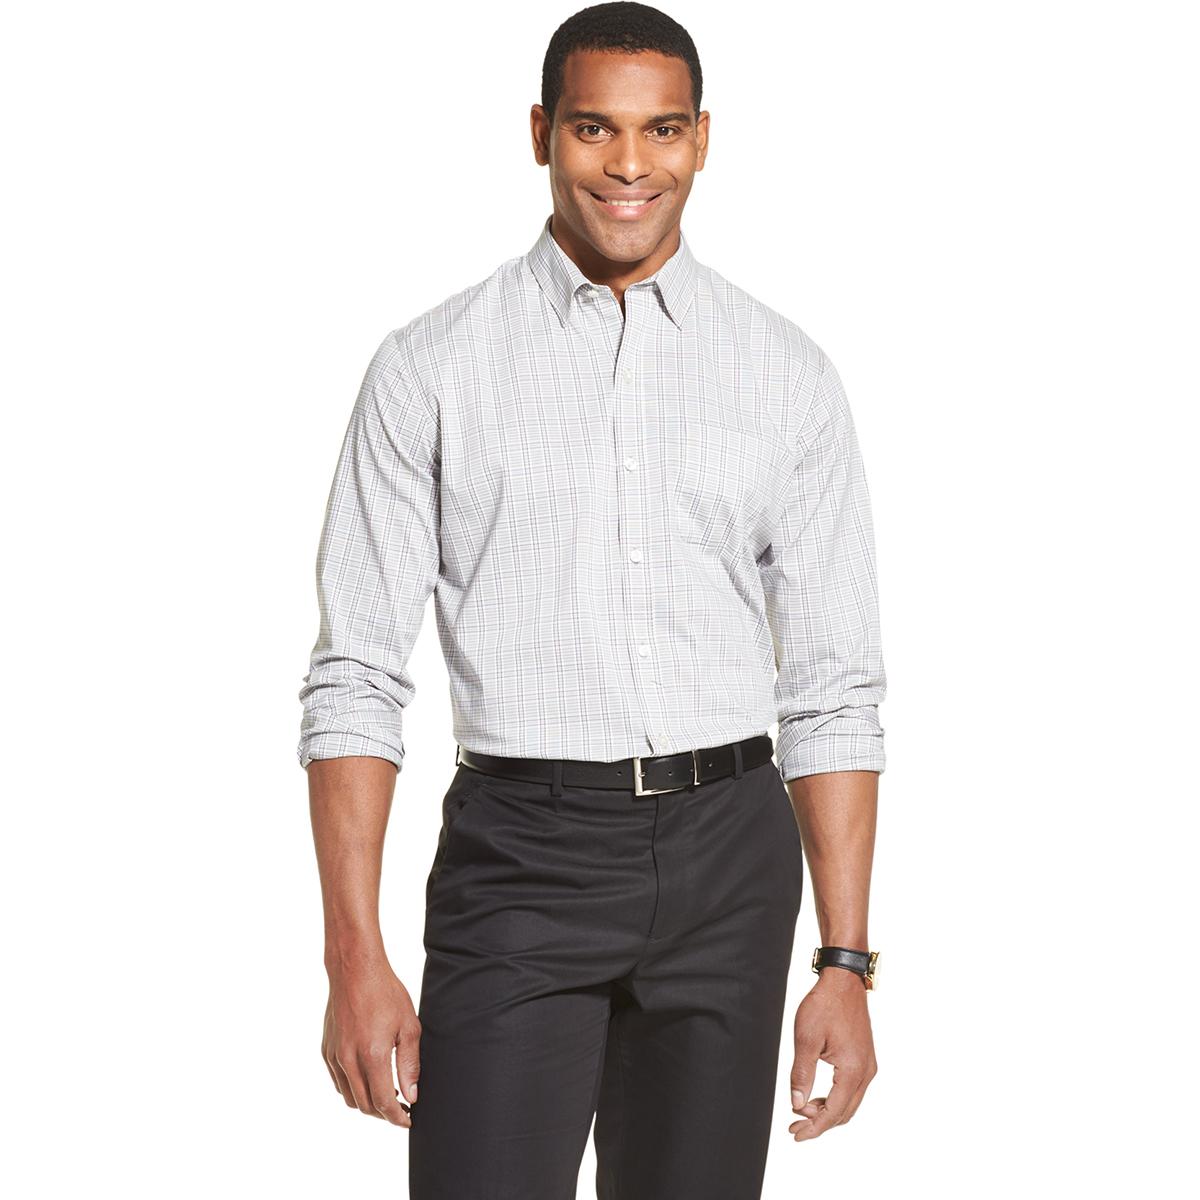 Van Heusen Men's Traveler Classic Fit Stain Shield Shirt - Purple, M